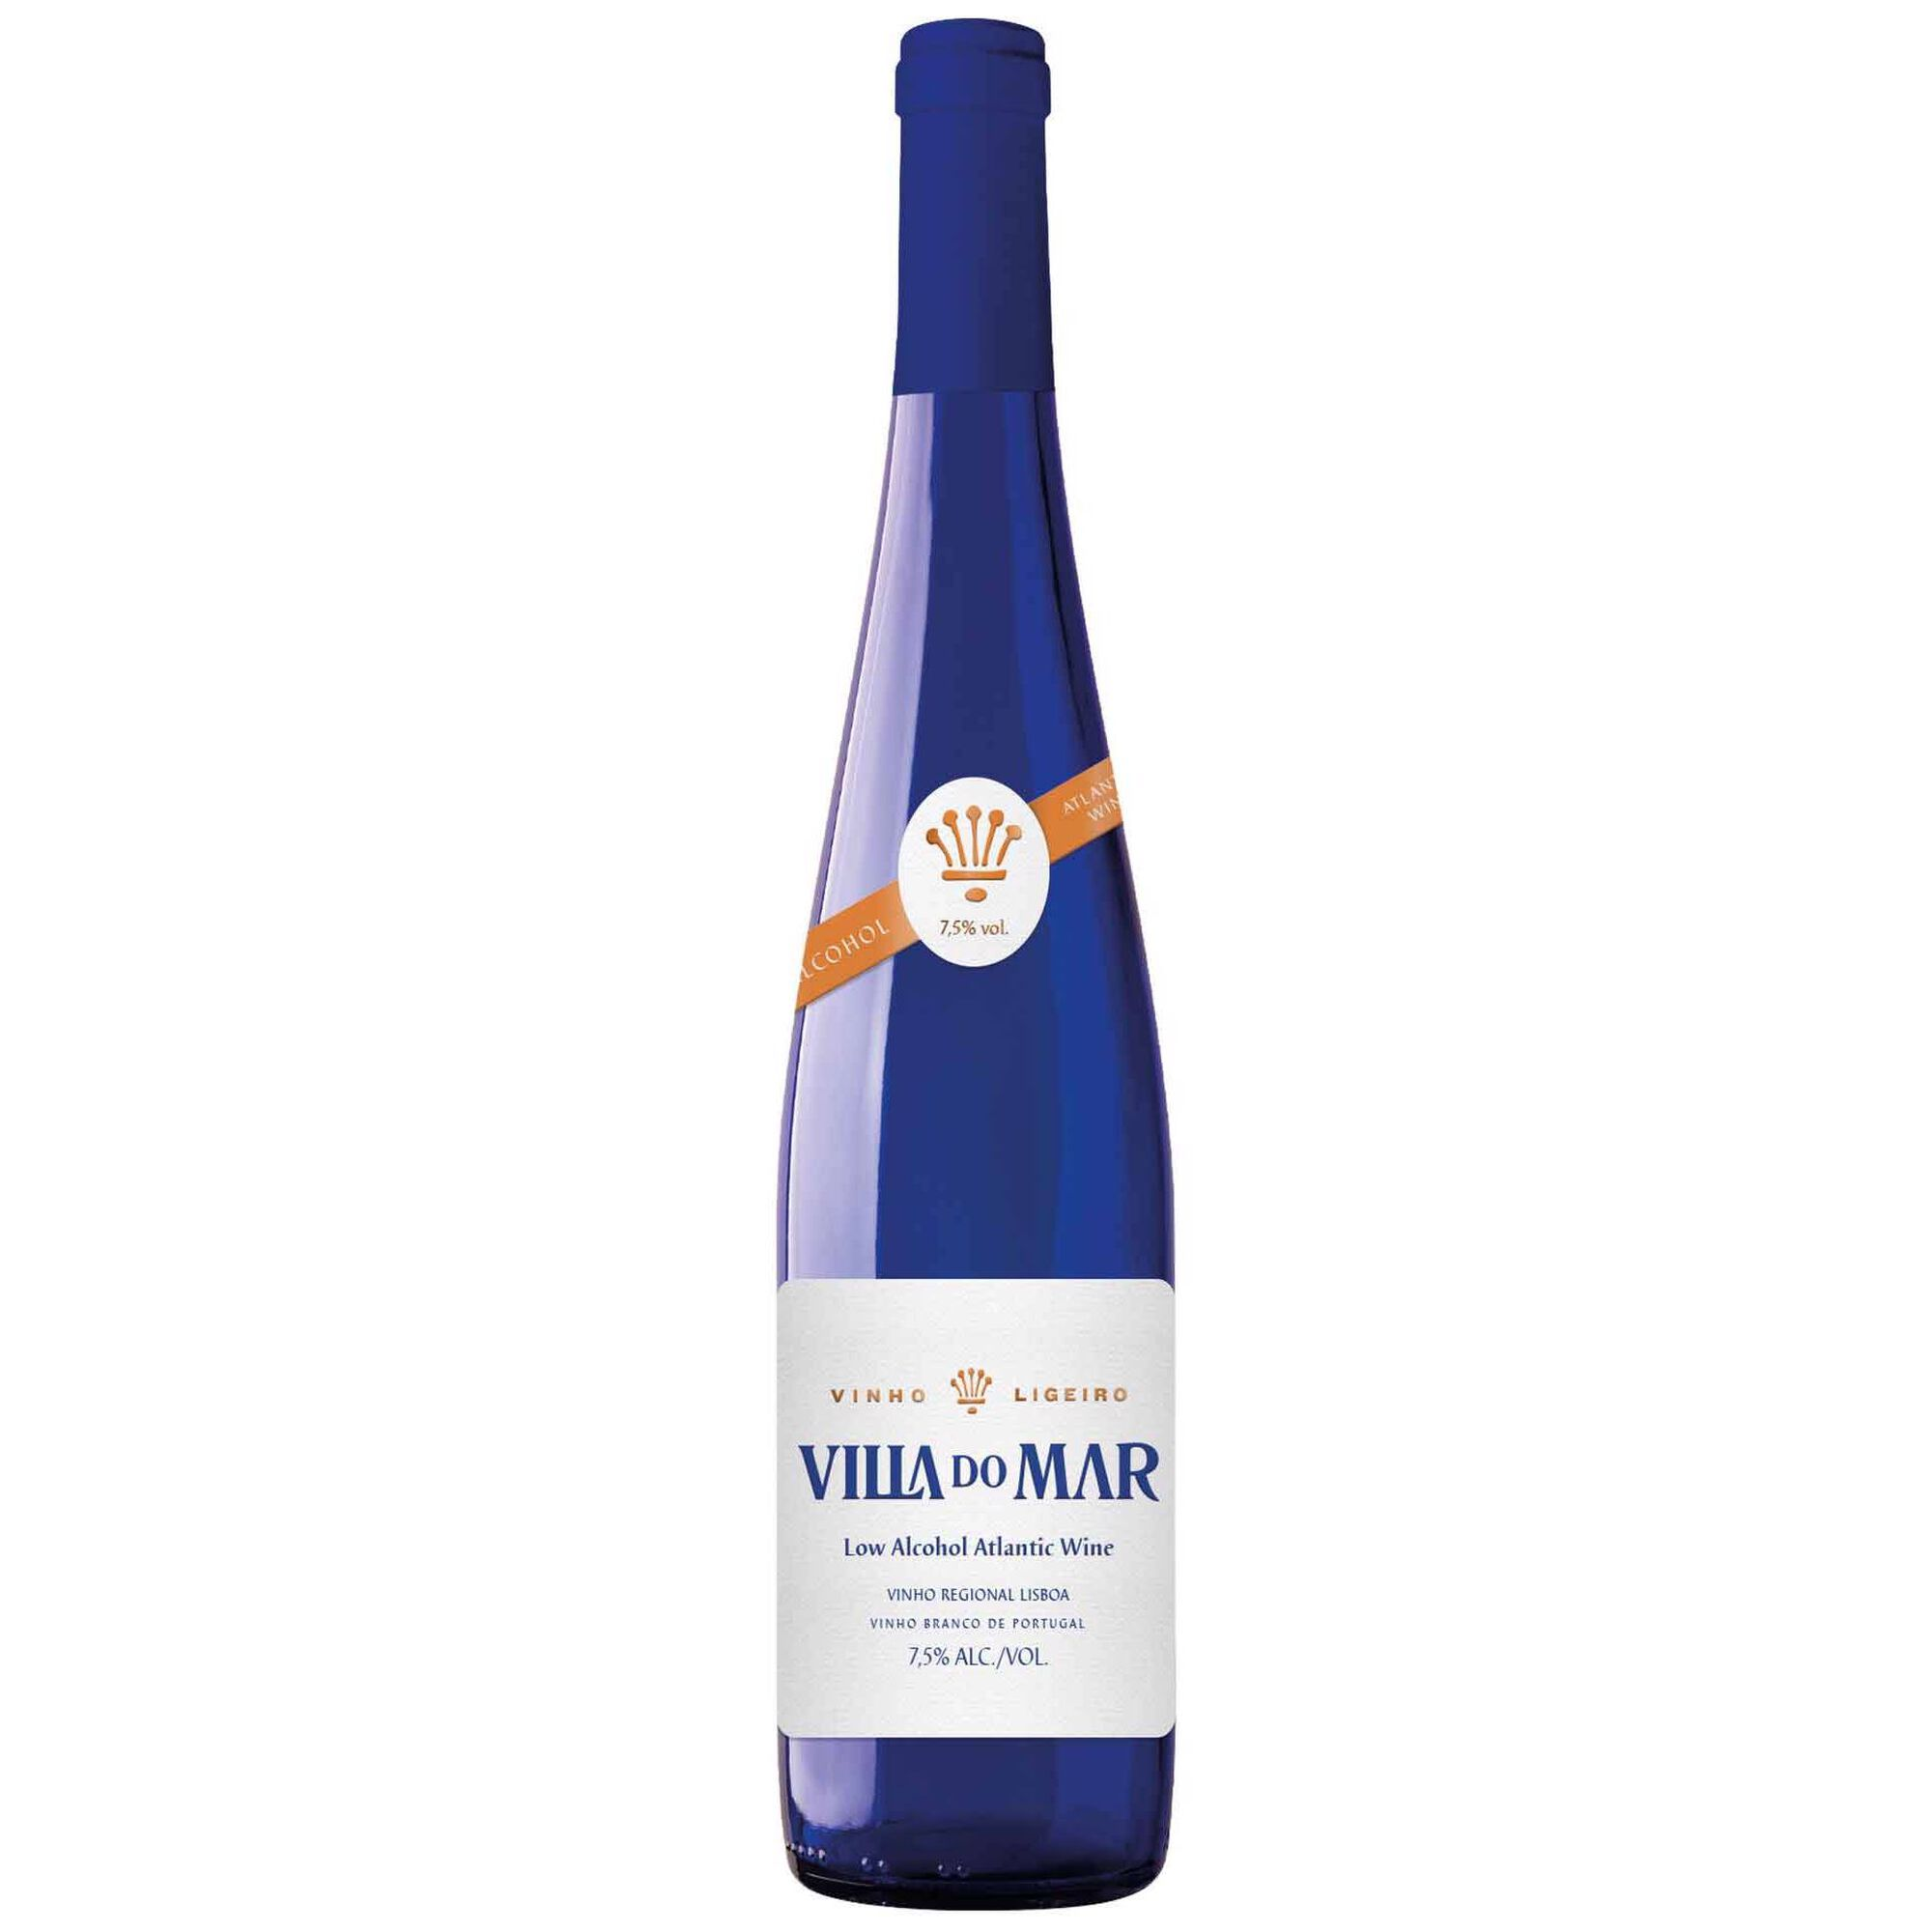 Villa do Mar Low Alcohol Vinho Regional Lisboa Branco